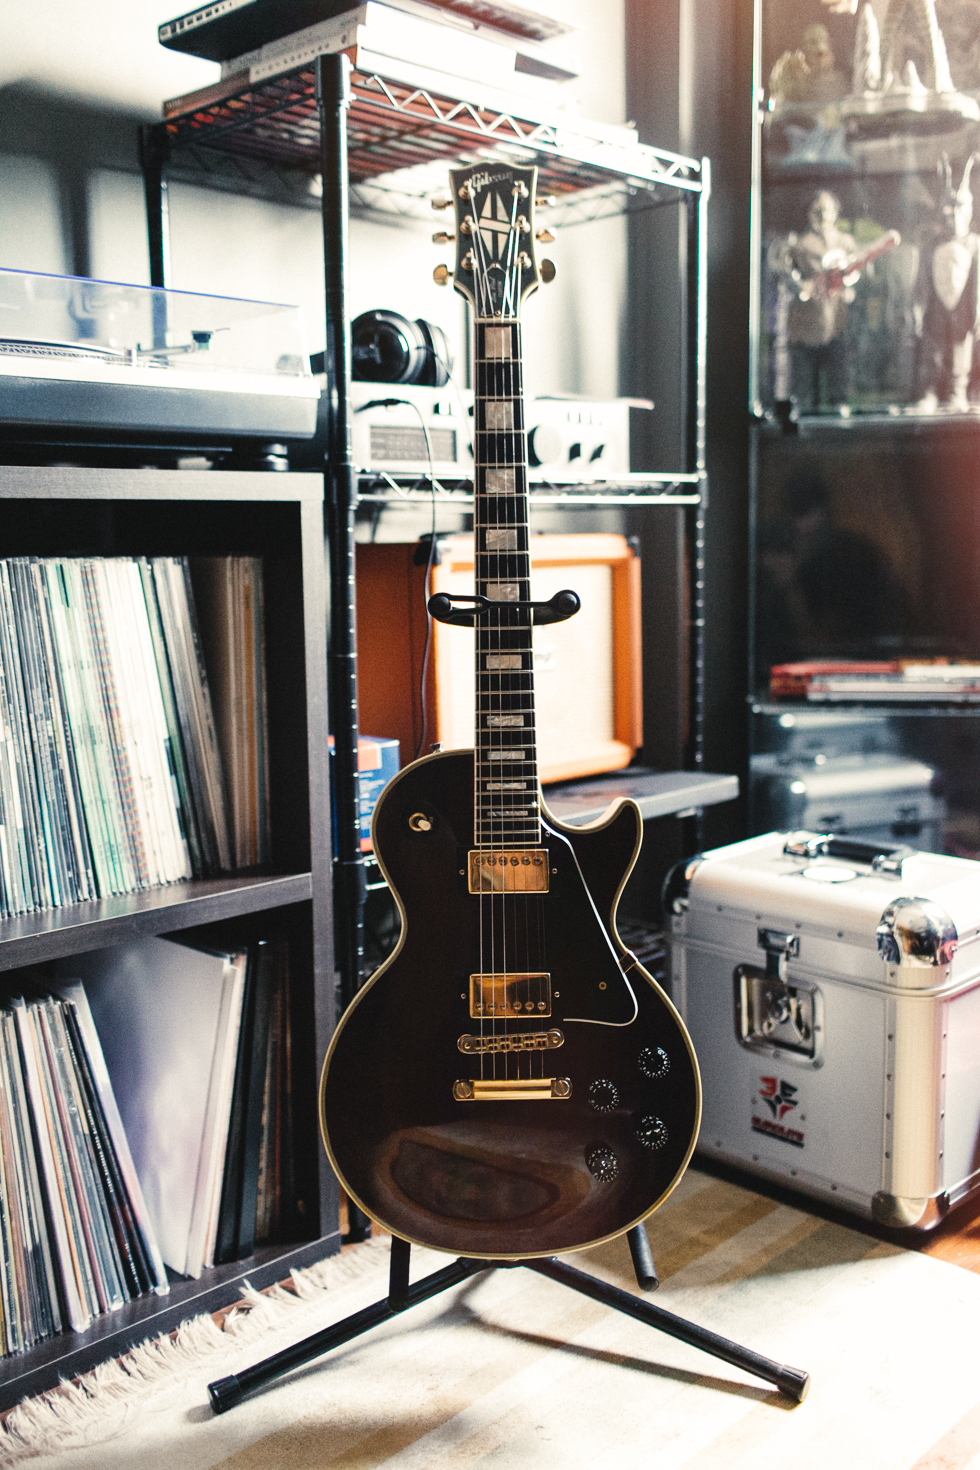 1996 Gibson Les Paul